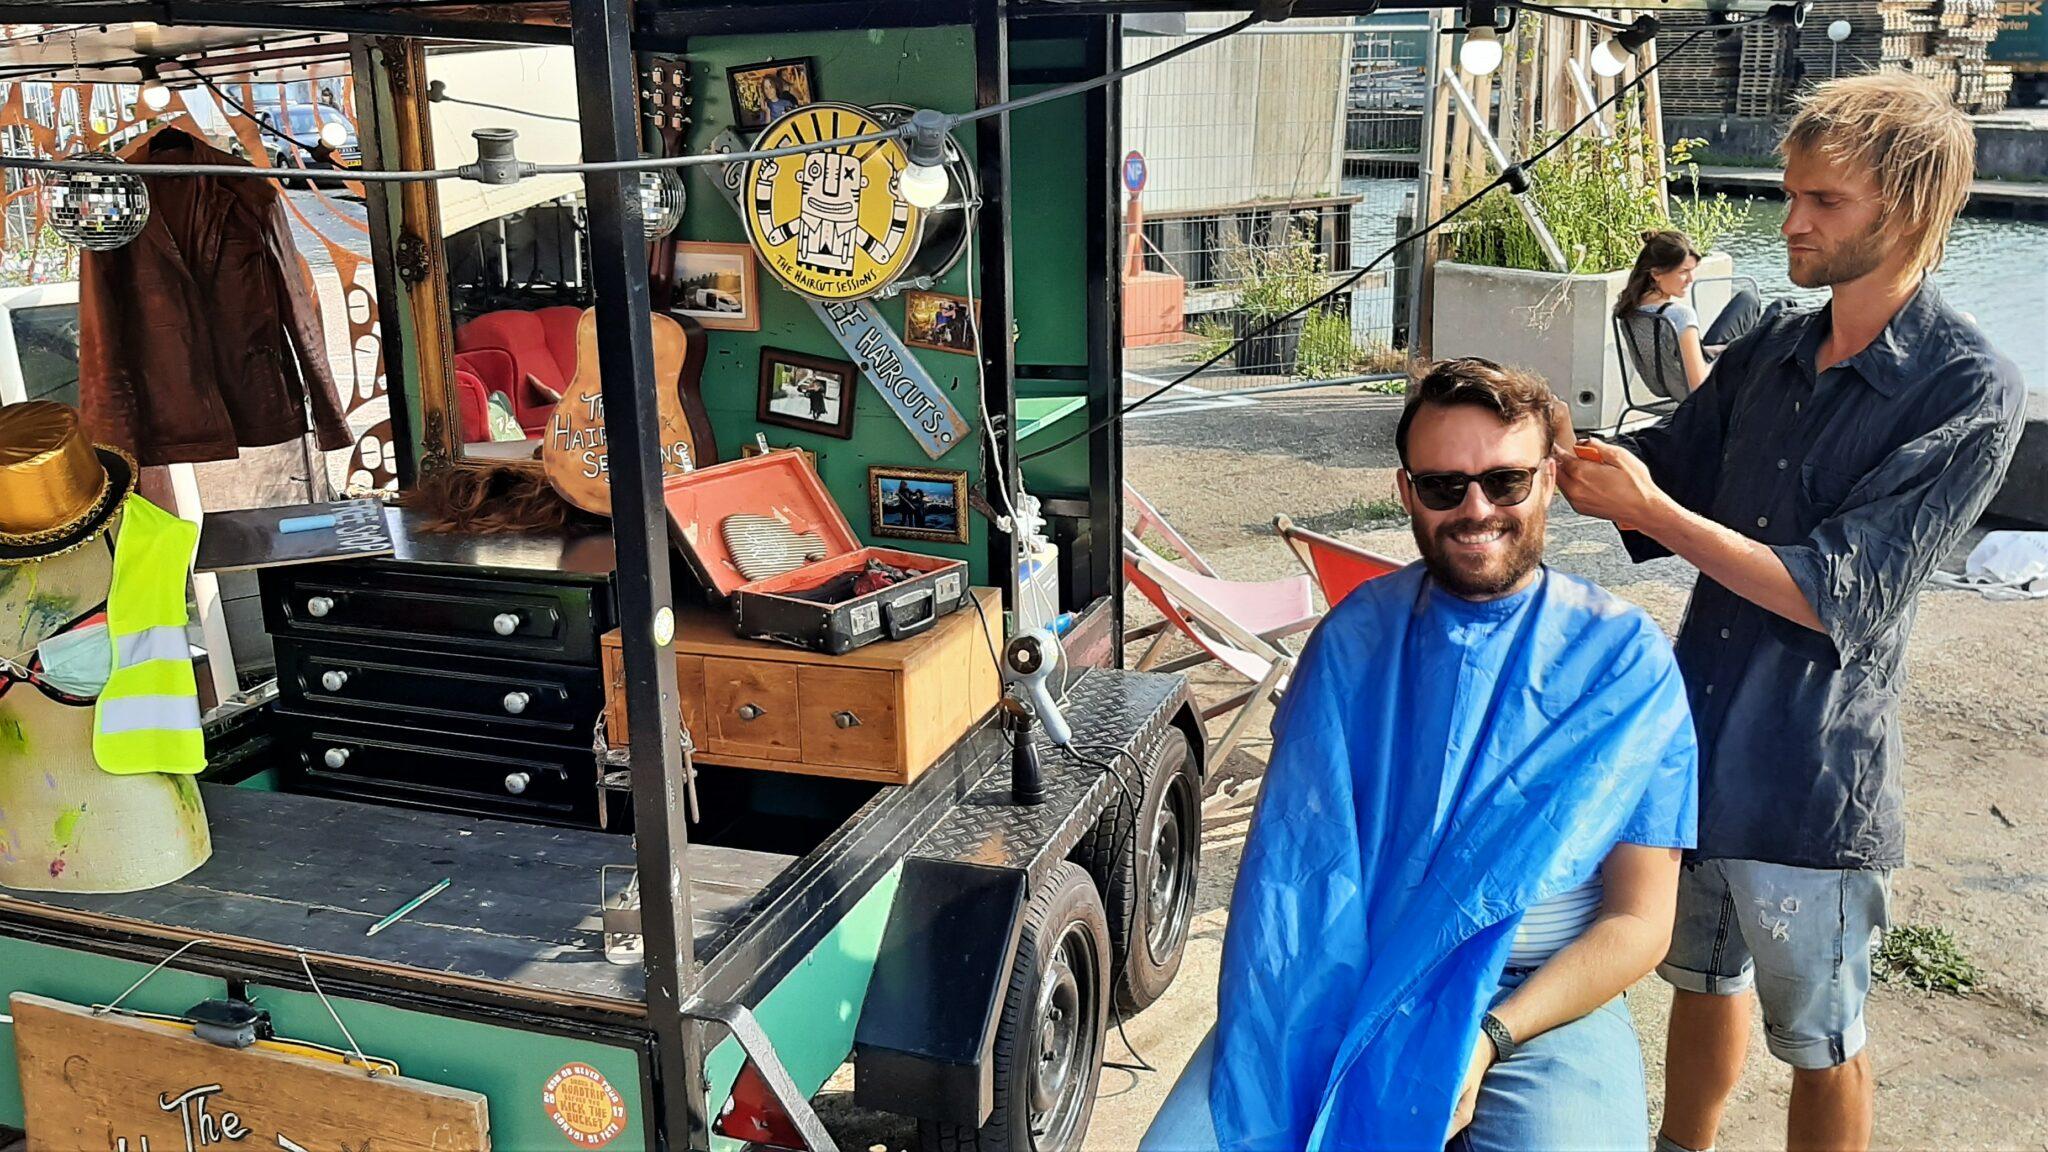 Patrick bij Haircutsessions